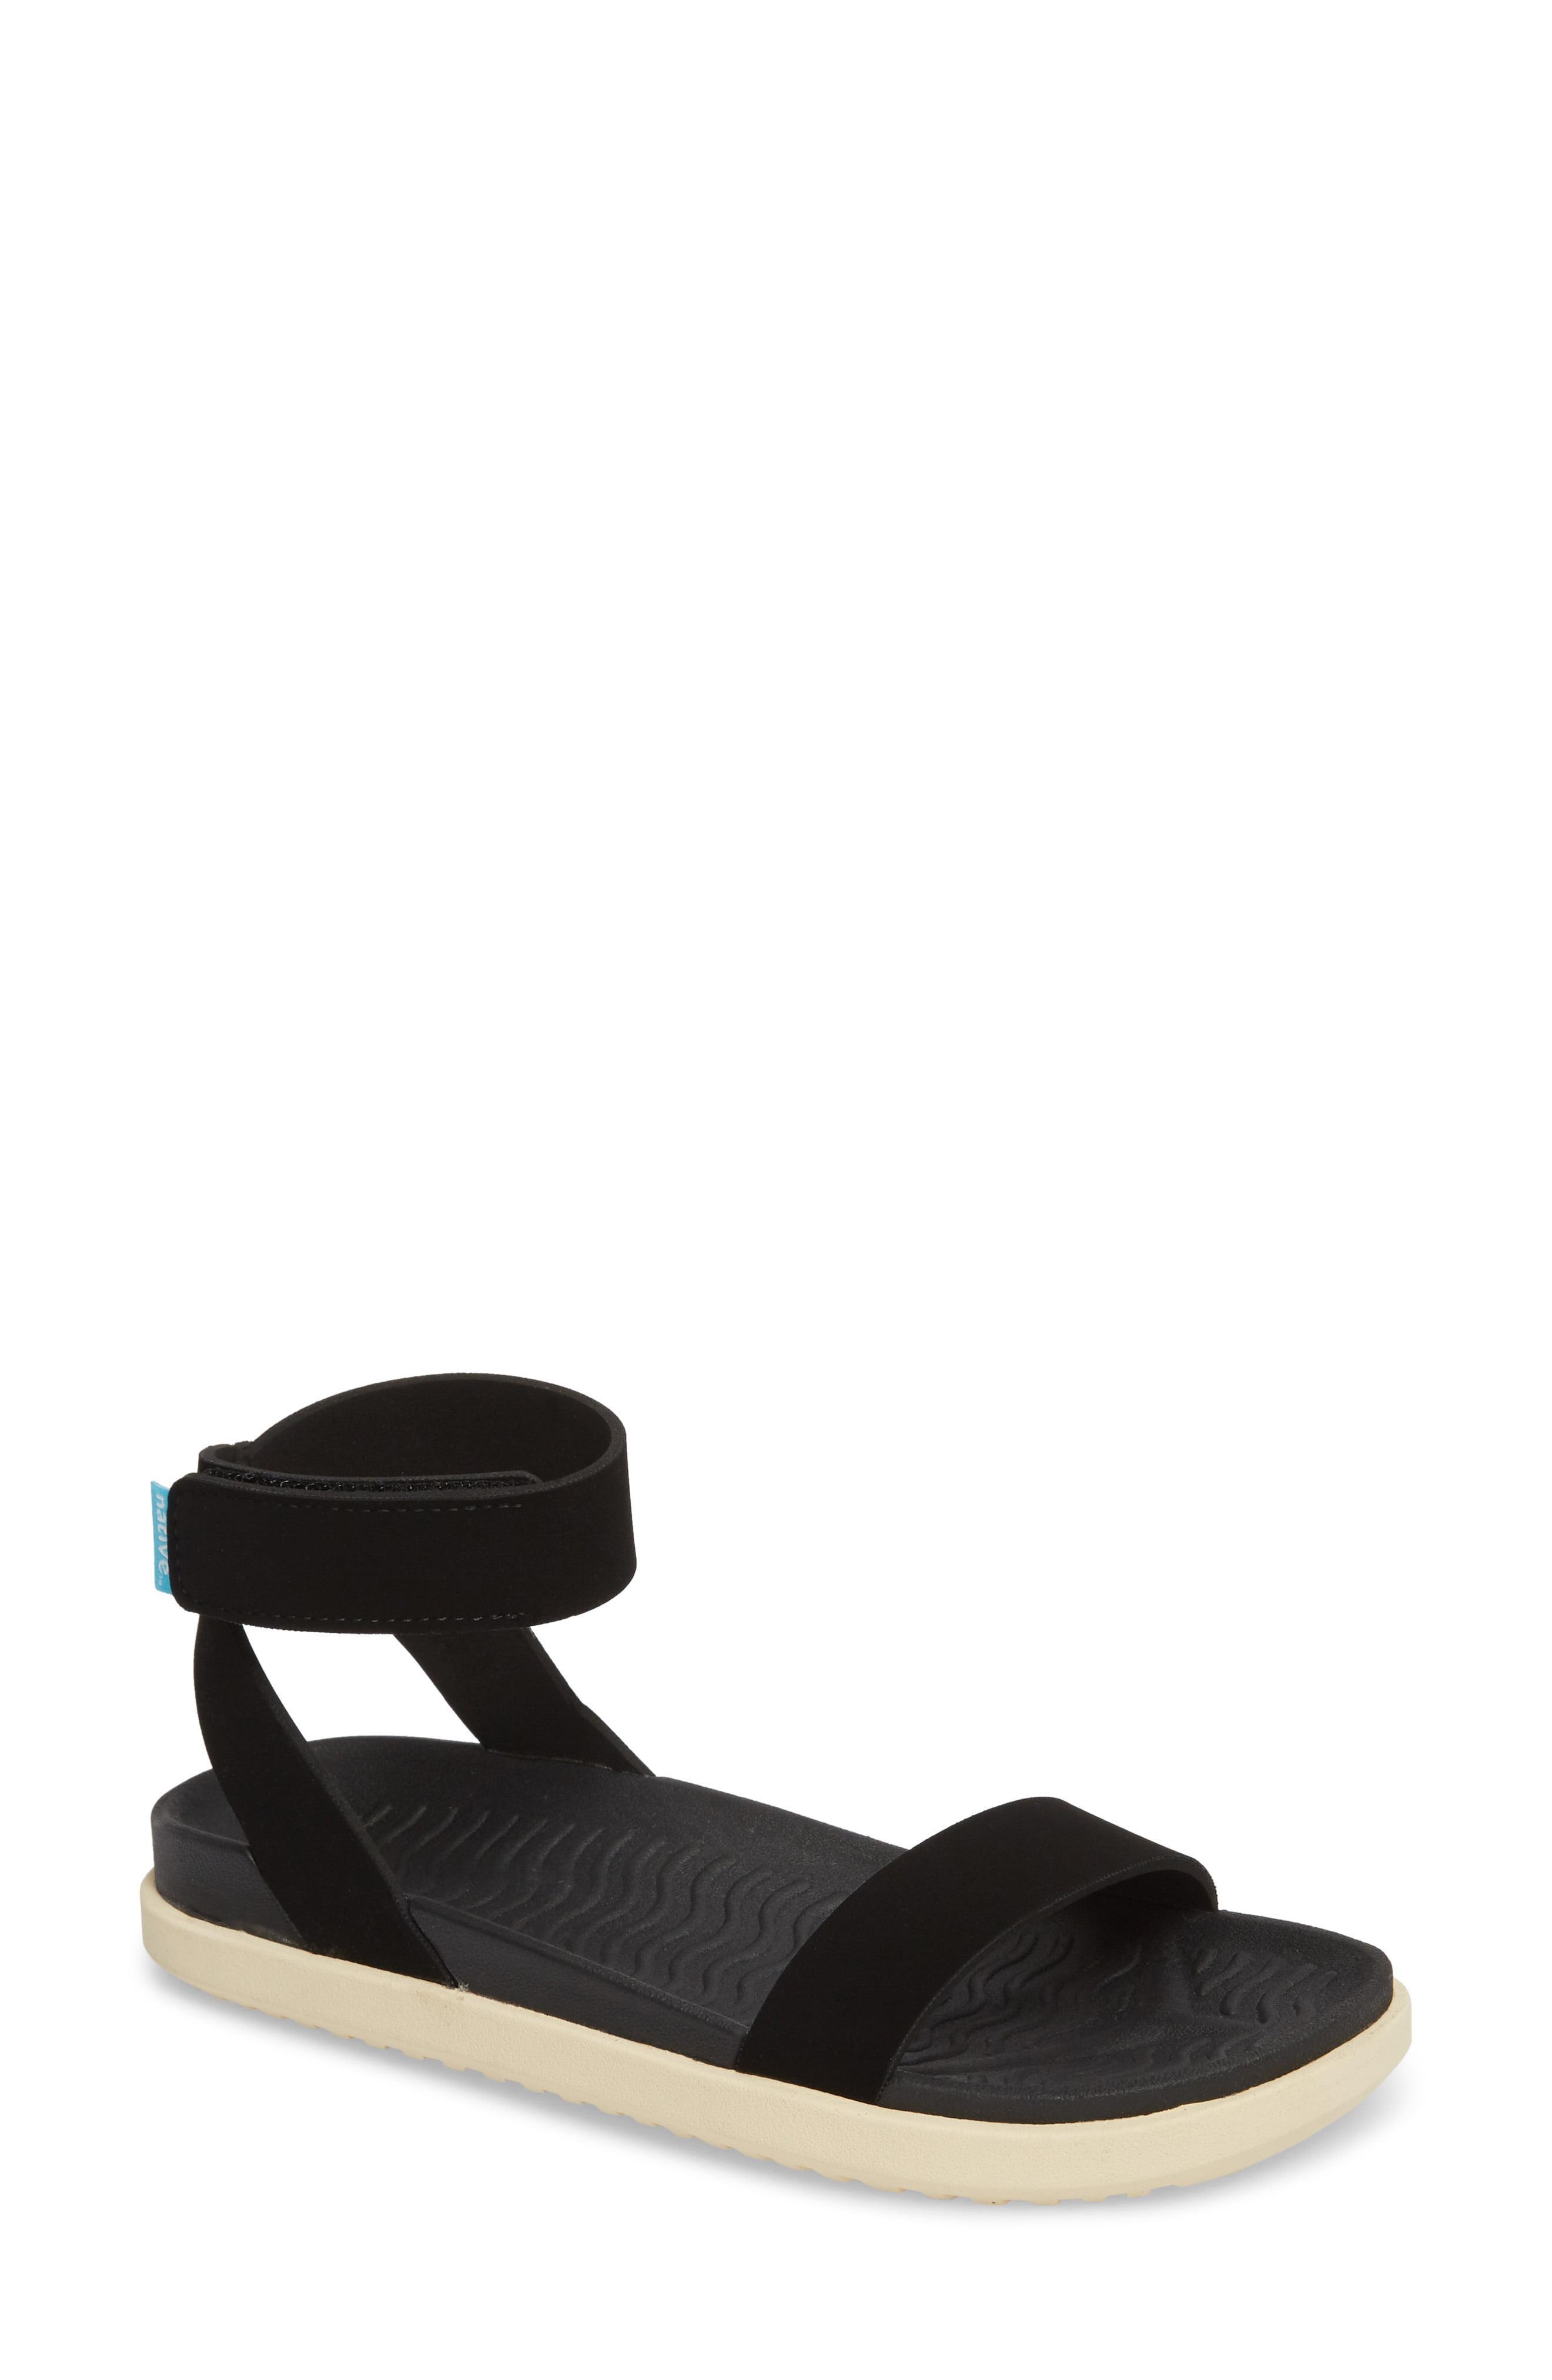 0dff2071aee Lyst - Native Shoes Juliet Sandal in Black